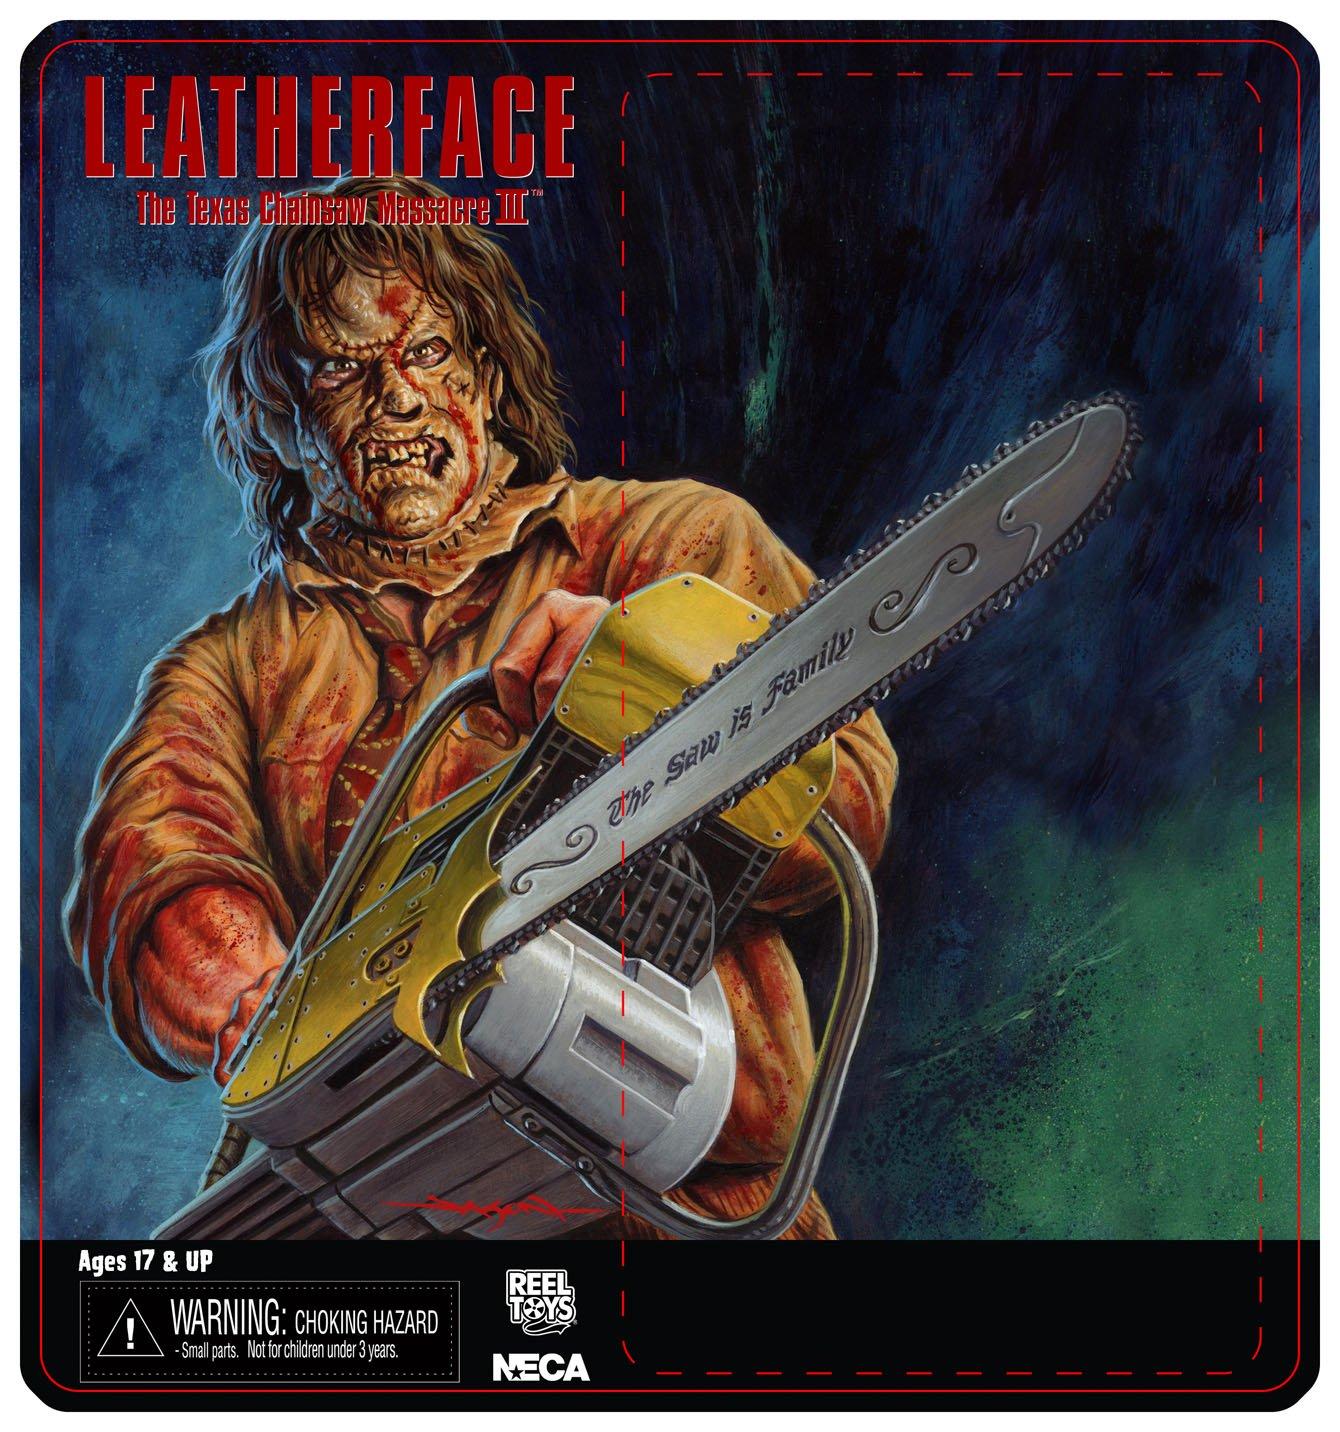 4defea877bf NECA Toys Leatherface  Texas Chainsaw Massacre 3 – 8″ Scale Leatherface  Retro Mego Style Figure Card Art